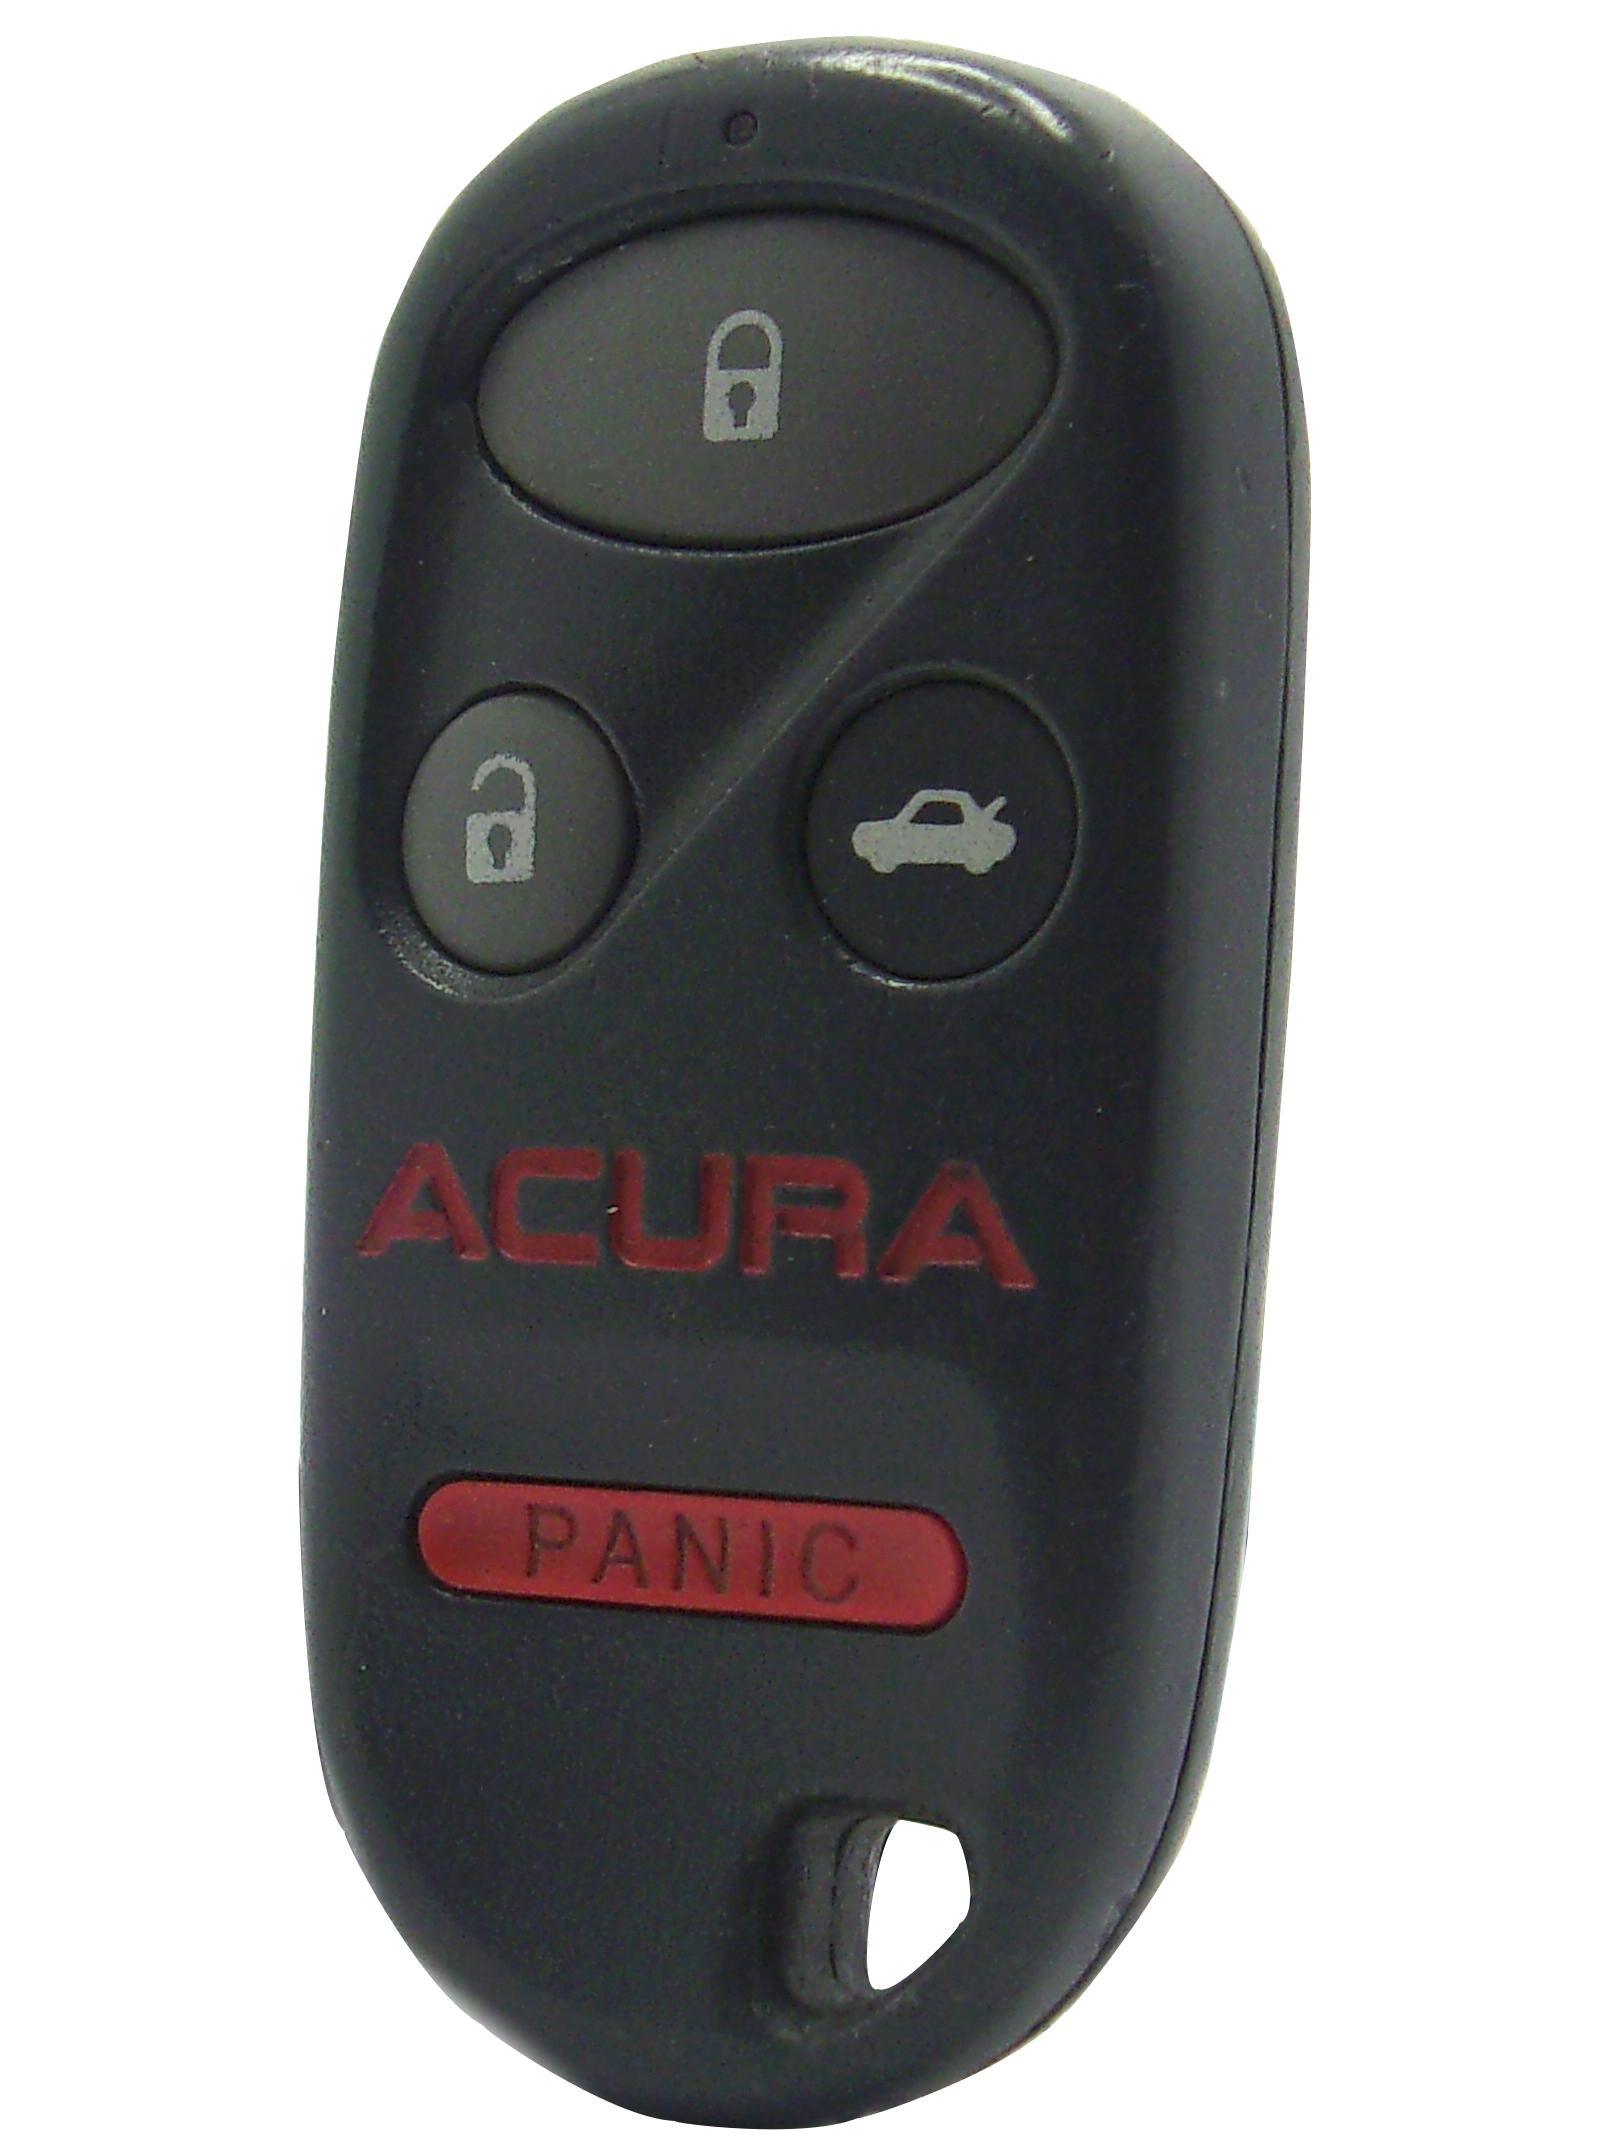 Acura Keyless Entry Remote - 4 Button w/ Car Trunk